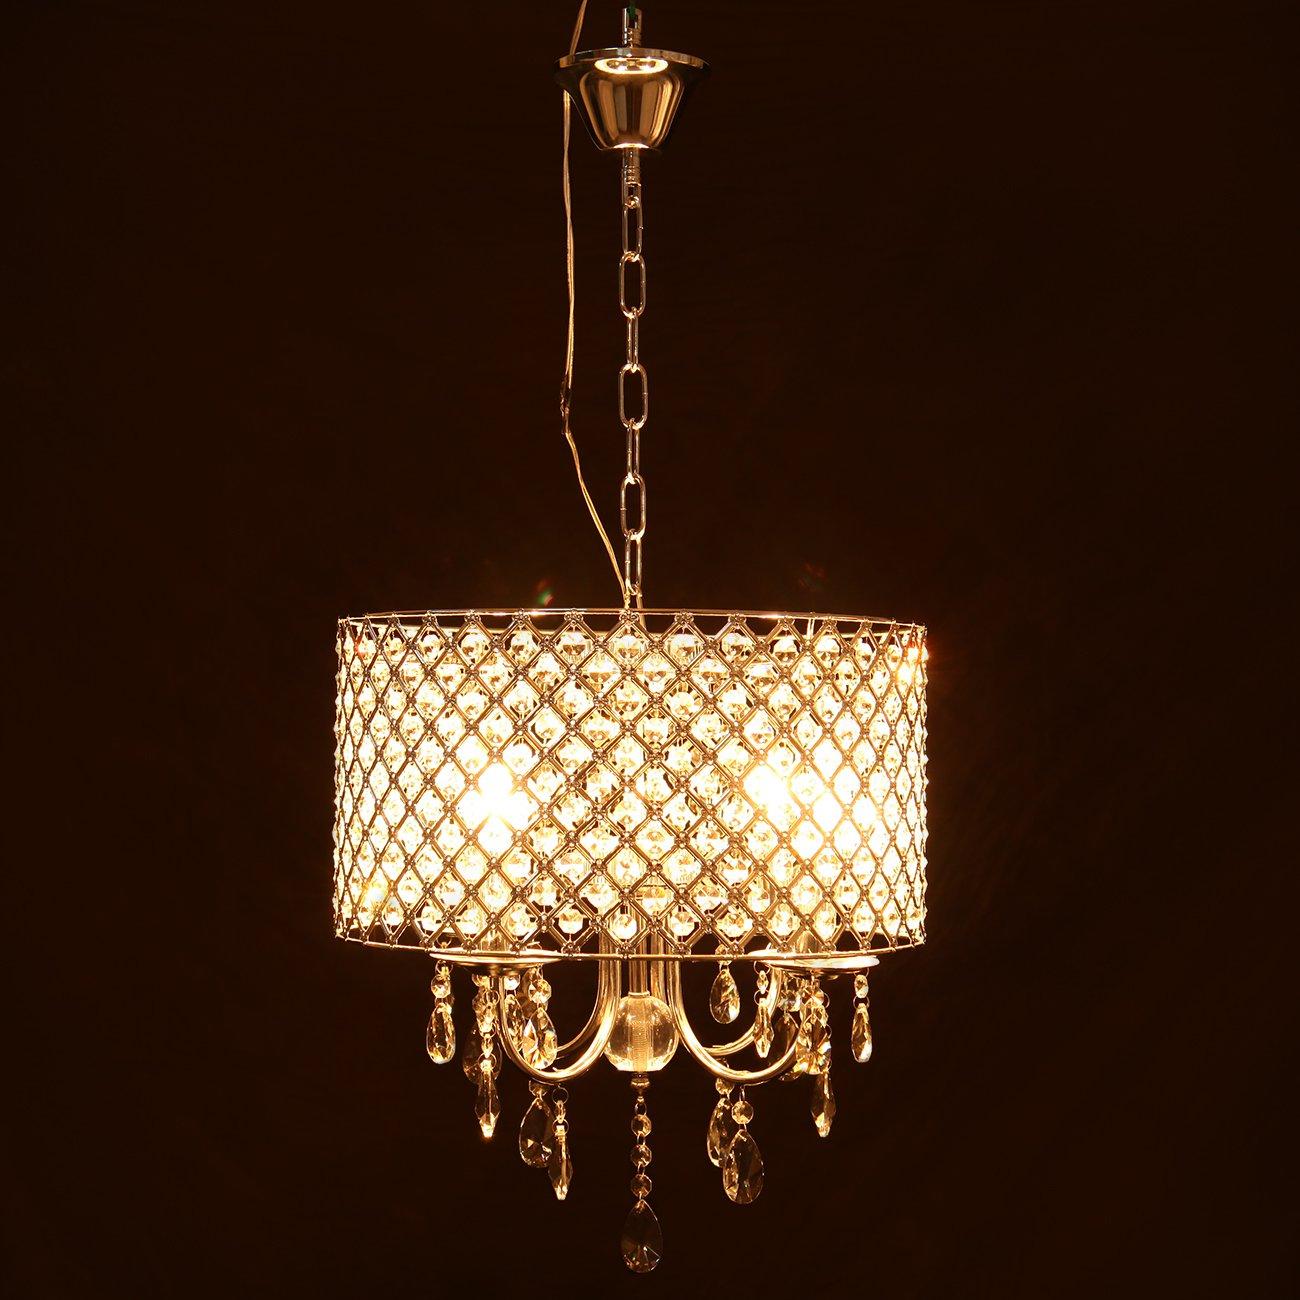 GroB Iglobalbuy Kritall Hängelampe Lampeschirm Kronleuchter Modern Deckenlampe  Pendelleuchte: Amazon.de: Beleuchtung